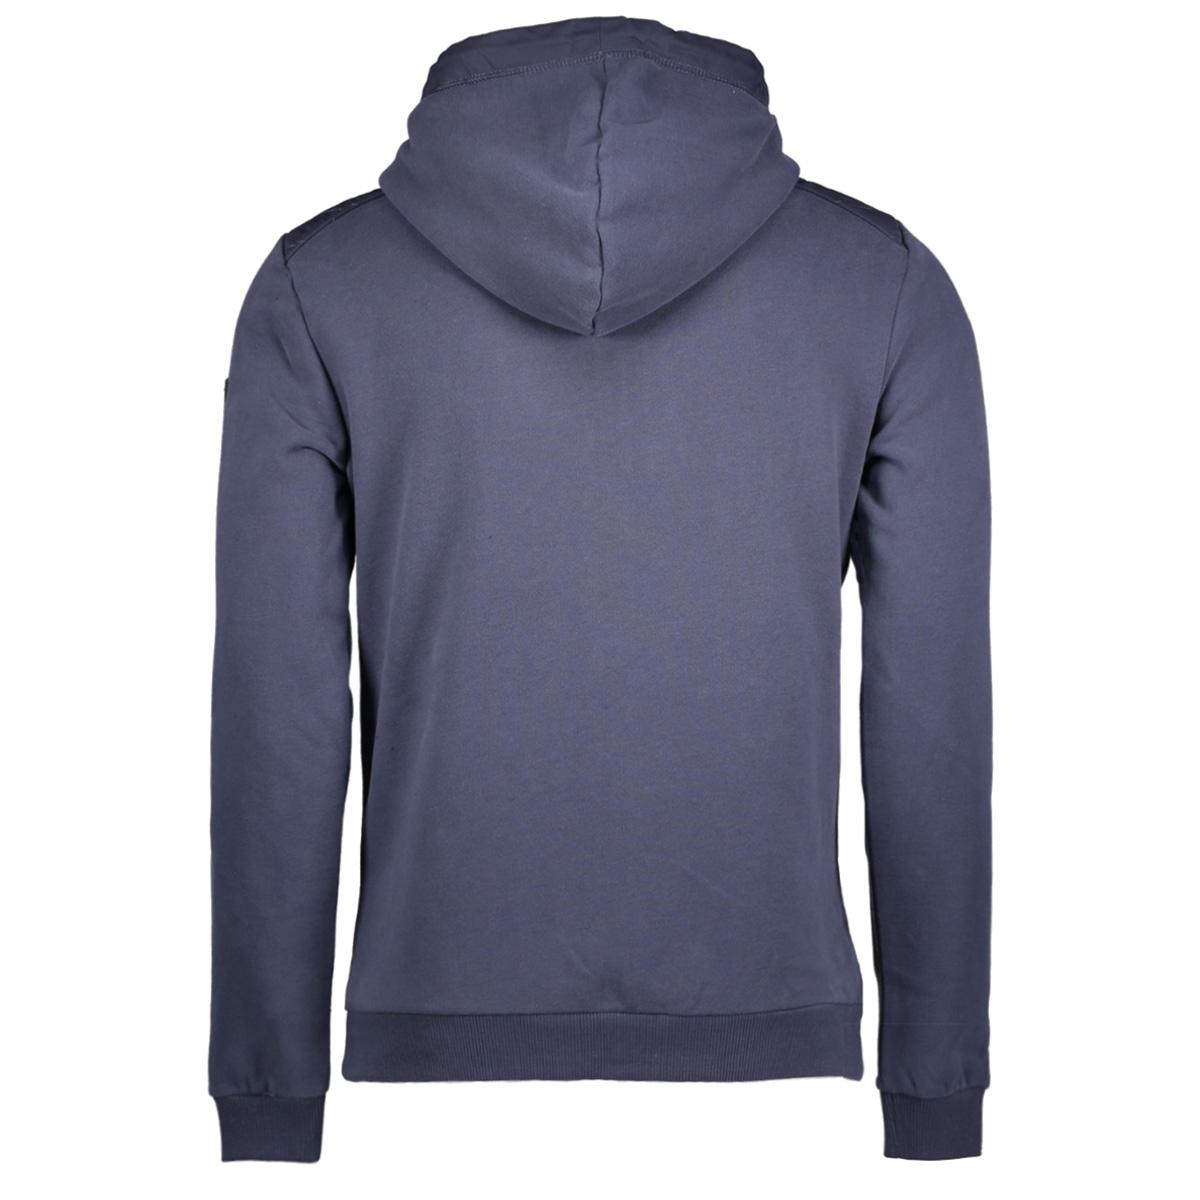 82100914 no-excess vest 123 shadow blue